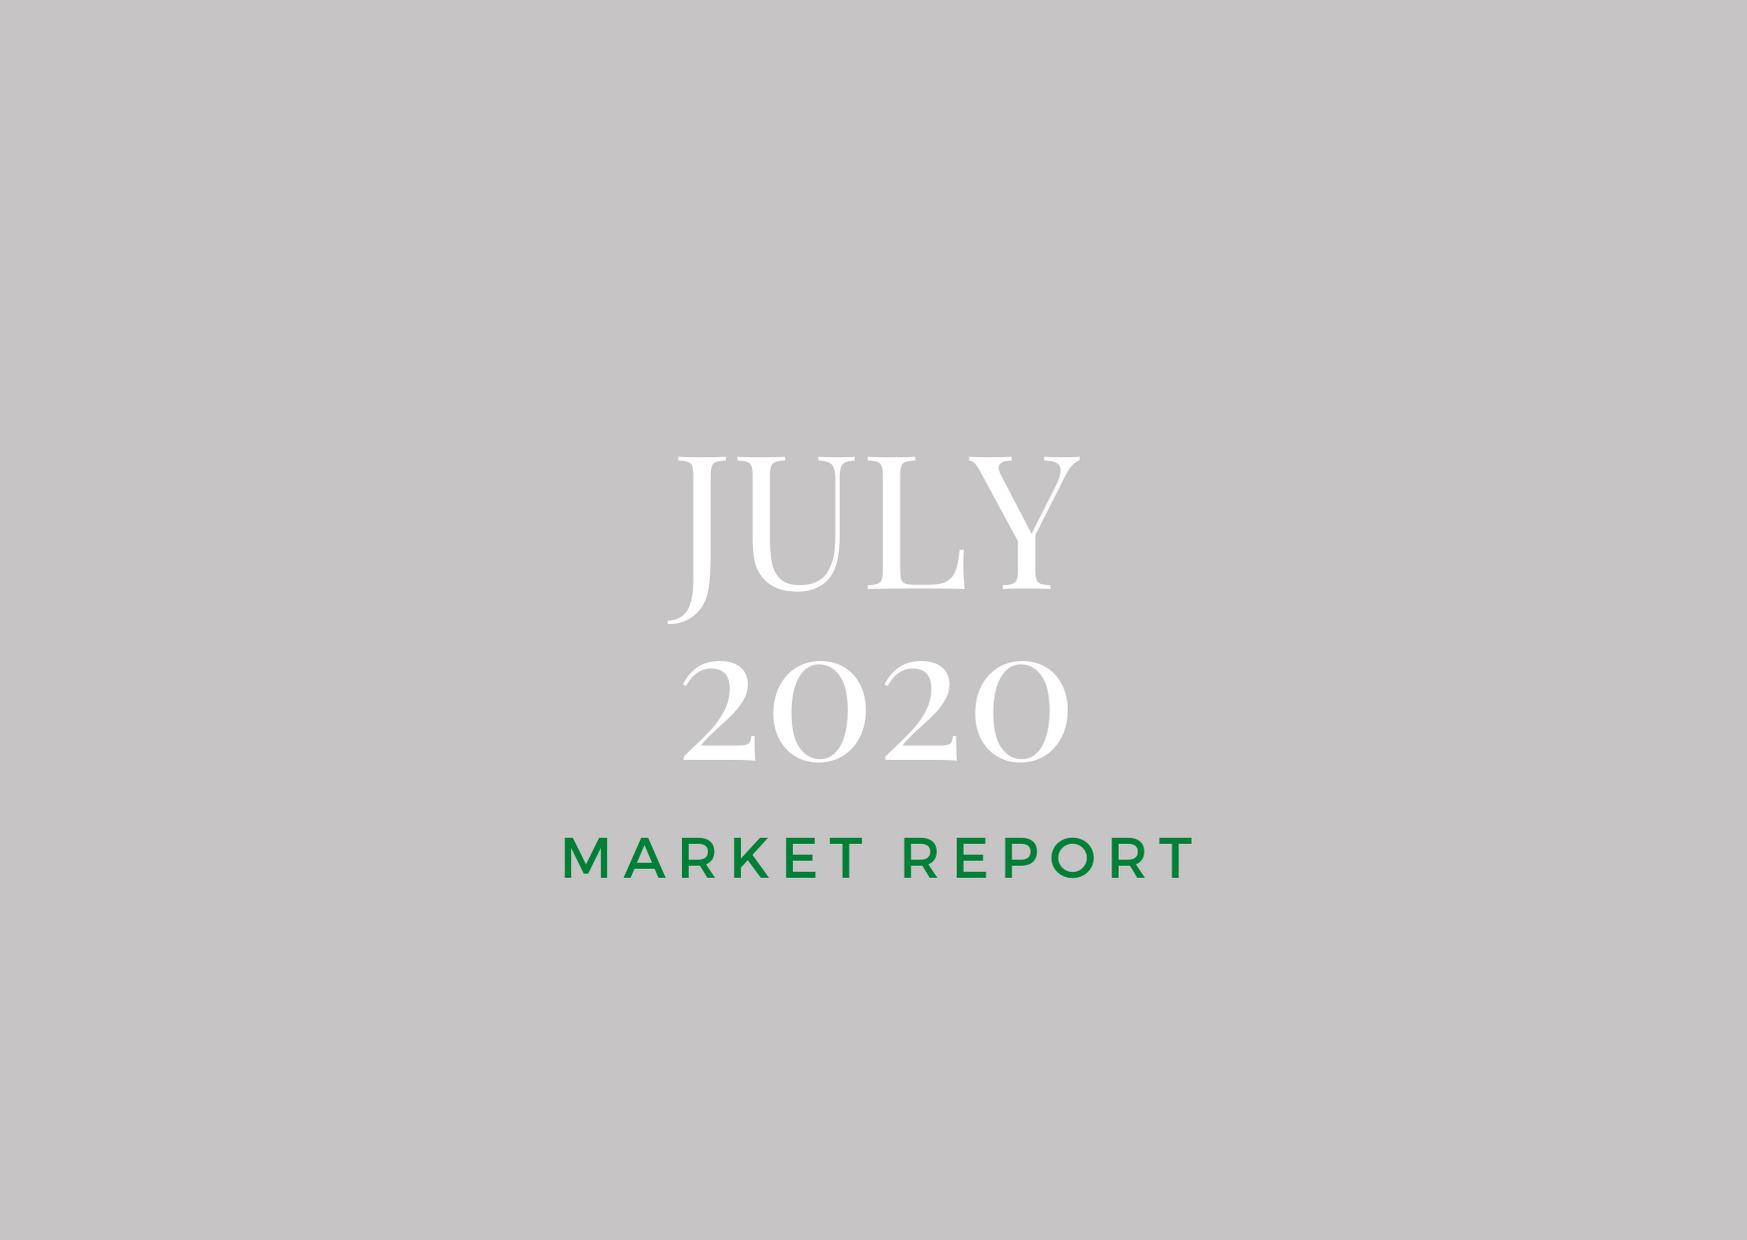 July 2020 Market Report